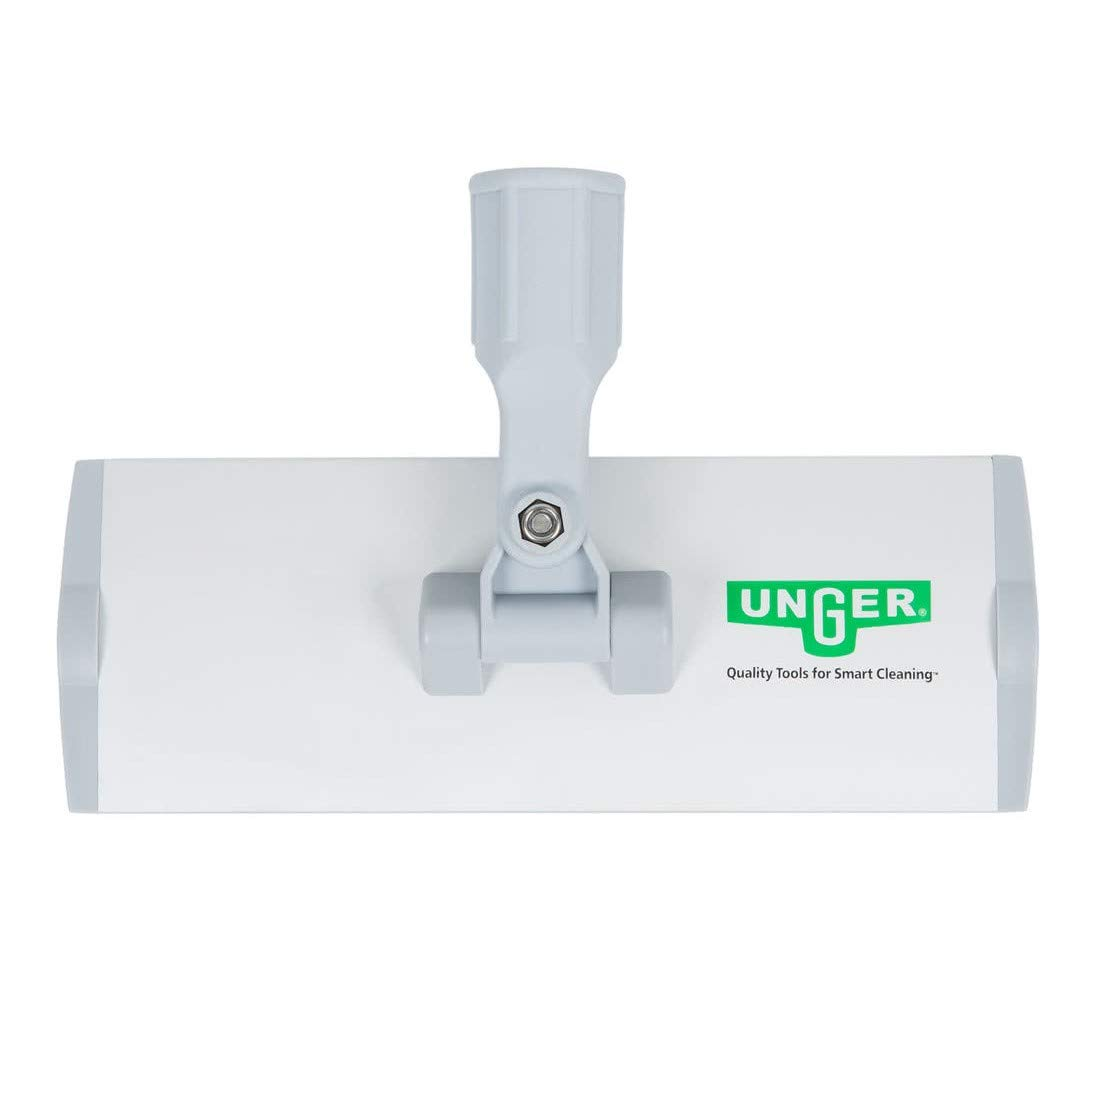 UNGER HiFlo Padhalter 20 cm Aluminiumhalter f/ür Innenreinigungs Pads